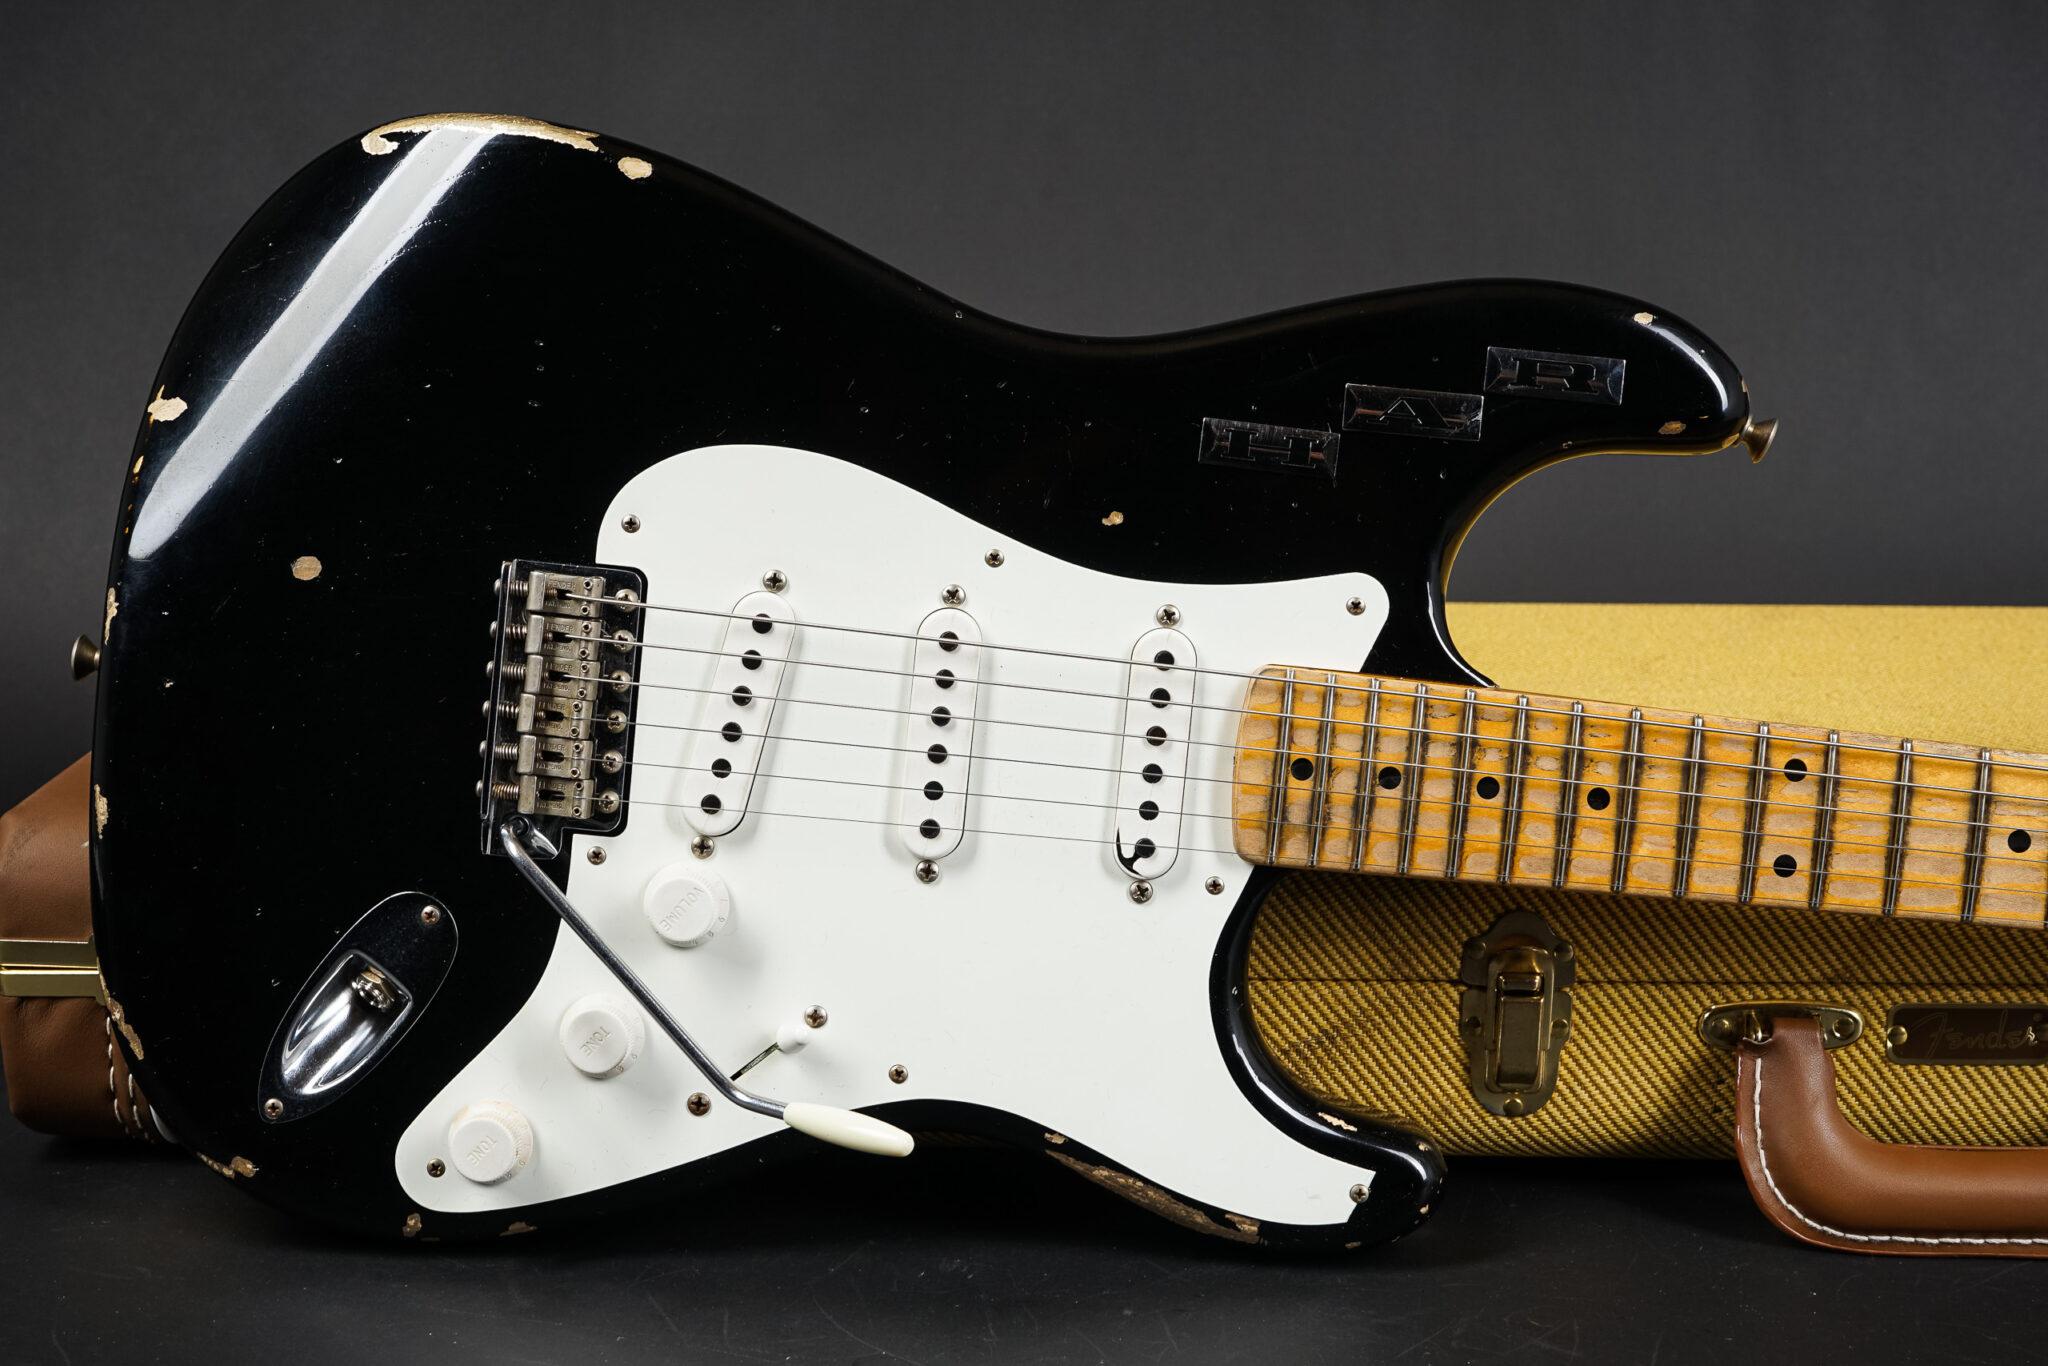 https://guitarpoint.de/app/uploads/products/2017-fender-masterbuilt-private-collection-dennis-galuszka-har-stratocaster-black/HAR-strat-bk-9-1-2048x1366.jpg